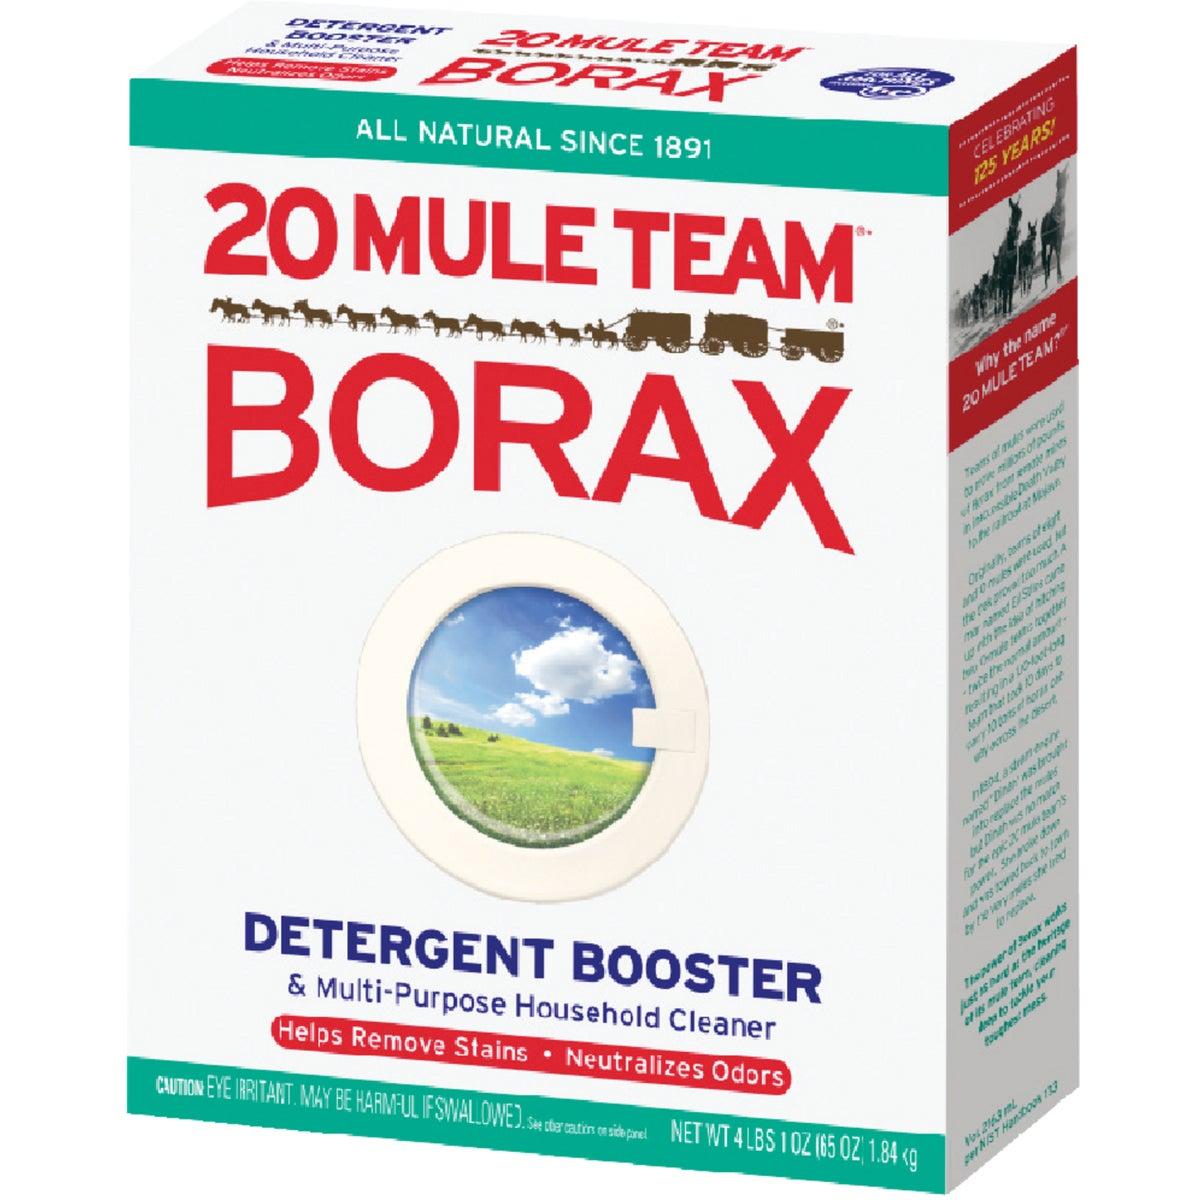 20 Mule-Team Borax Laundry Booster, DIA 00201